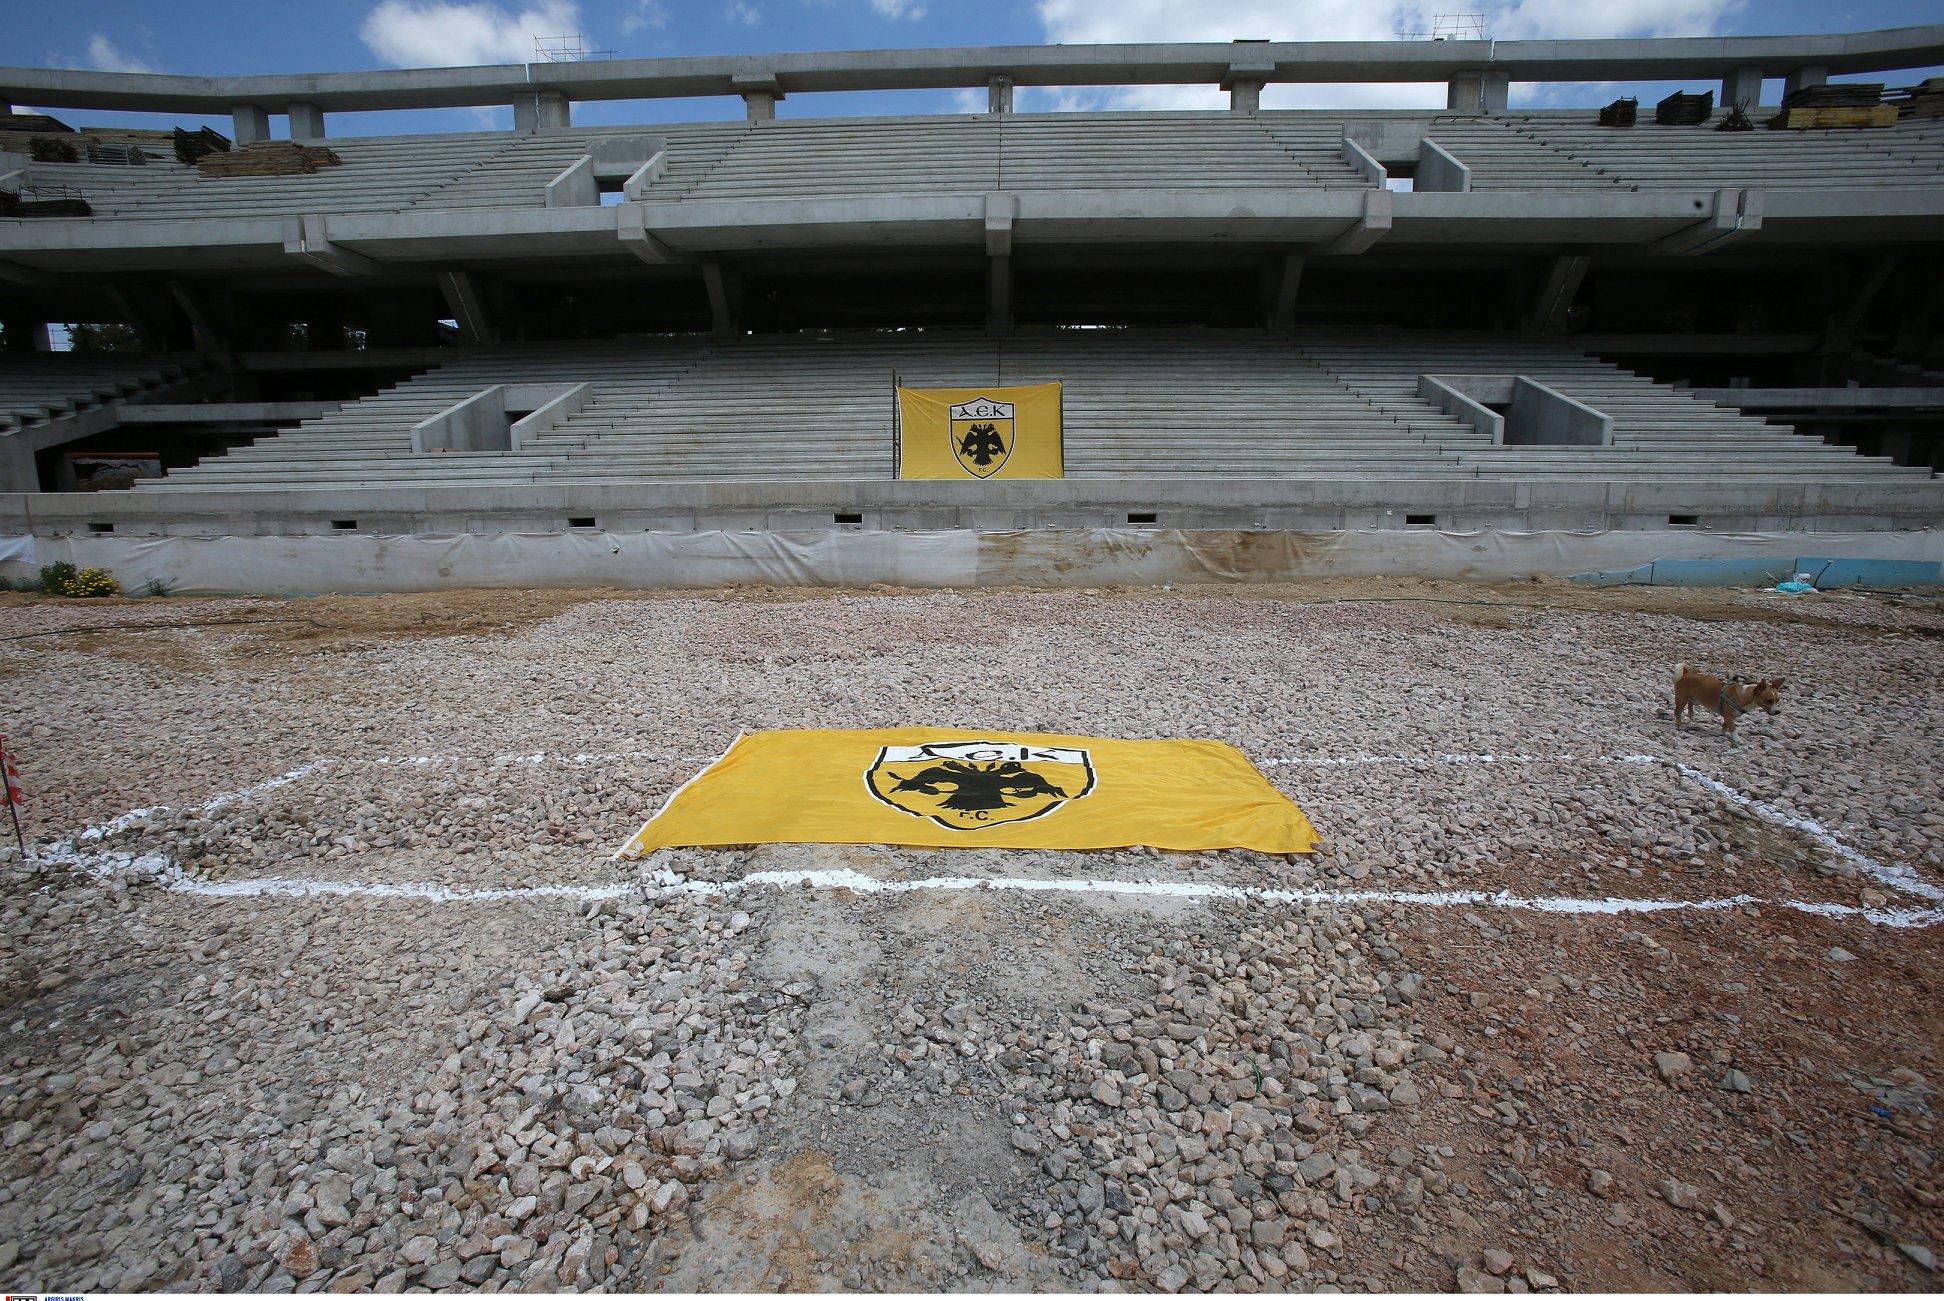 AEK flag in new stadium